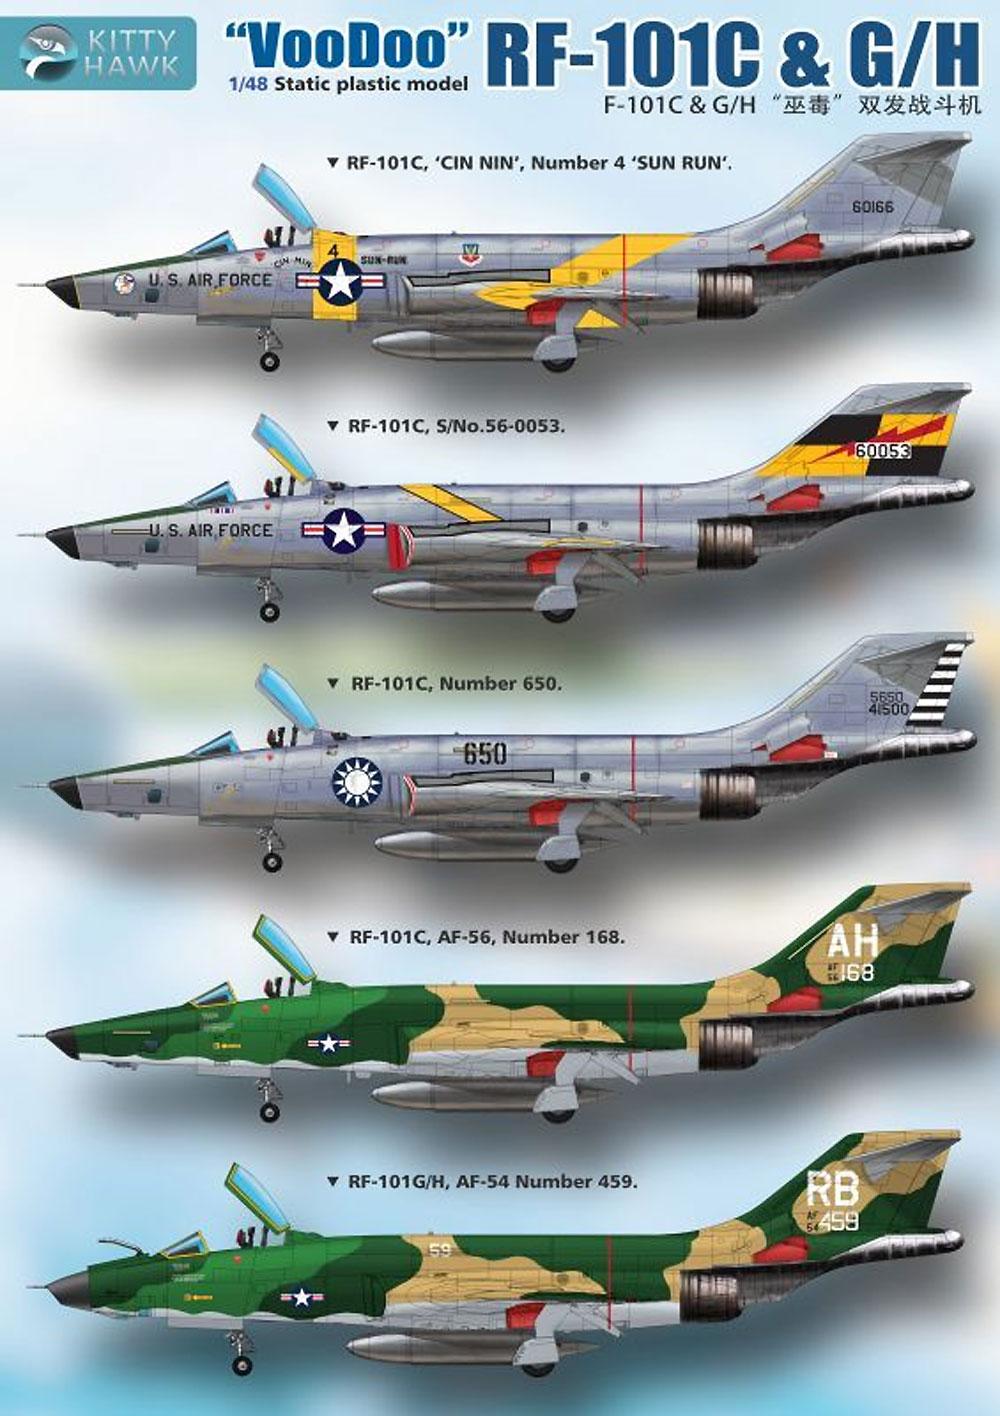 RF-101C & G/H ヴードゥー 偵察機(プラモデル)(キティホーク1/48 ミリタリーNo.KH80116)商品画像_2